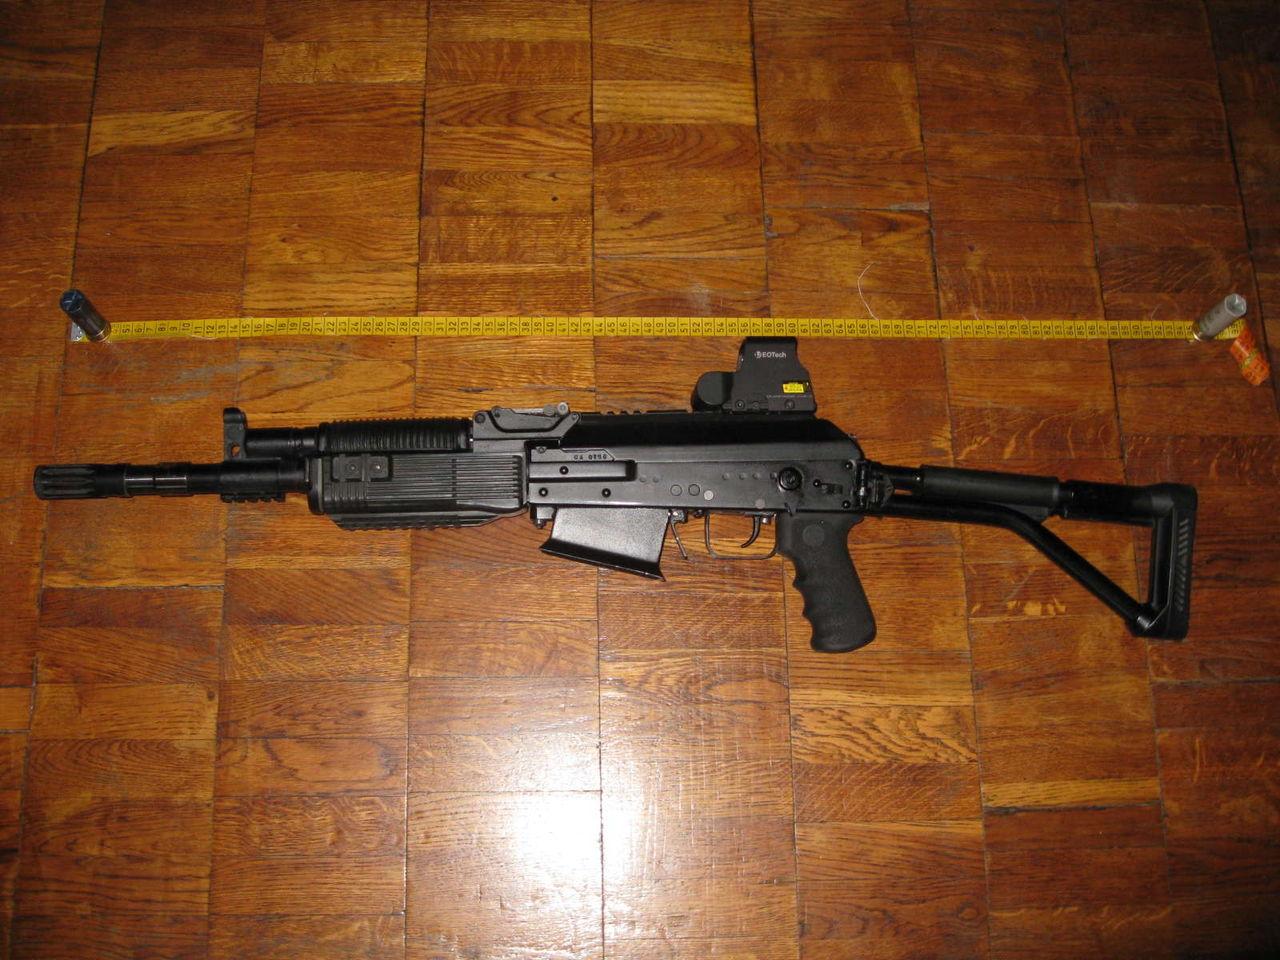 Ружье Сайга 12с и 12к модели калибр характеристики